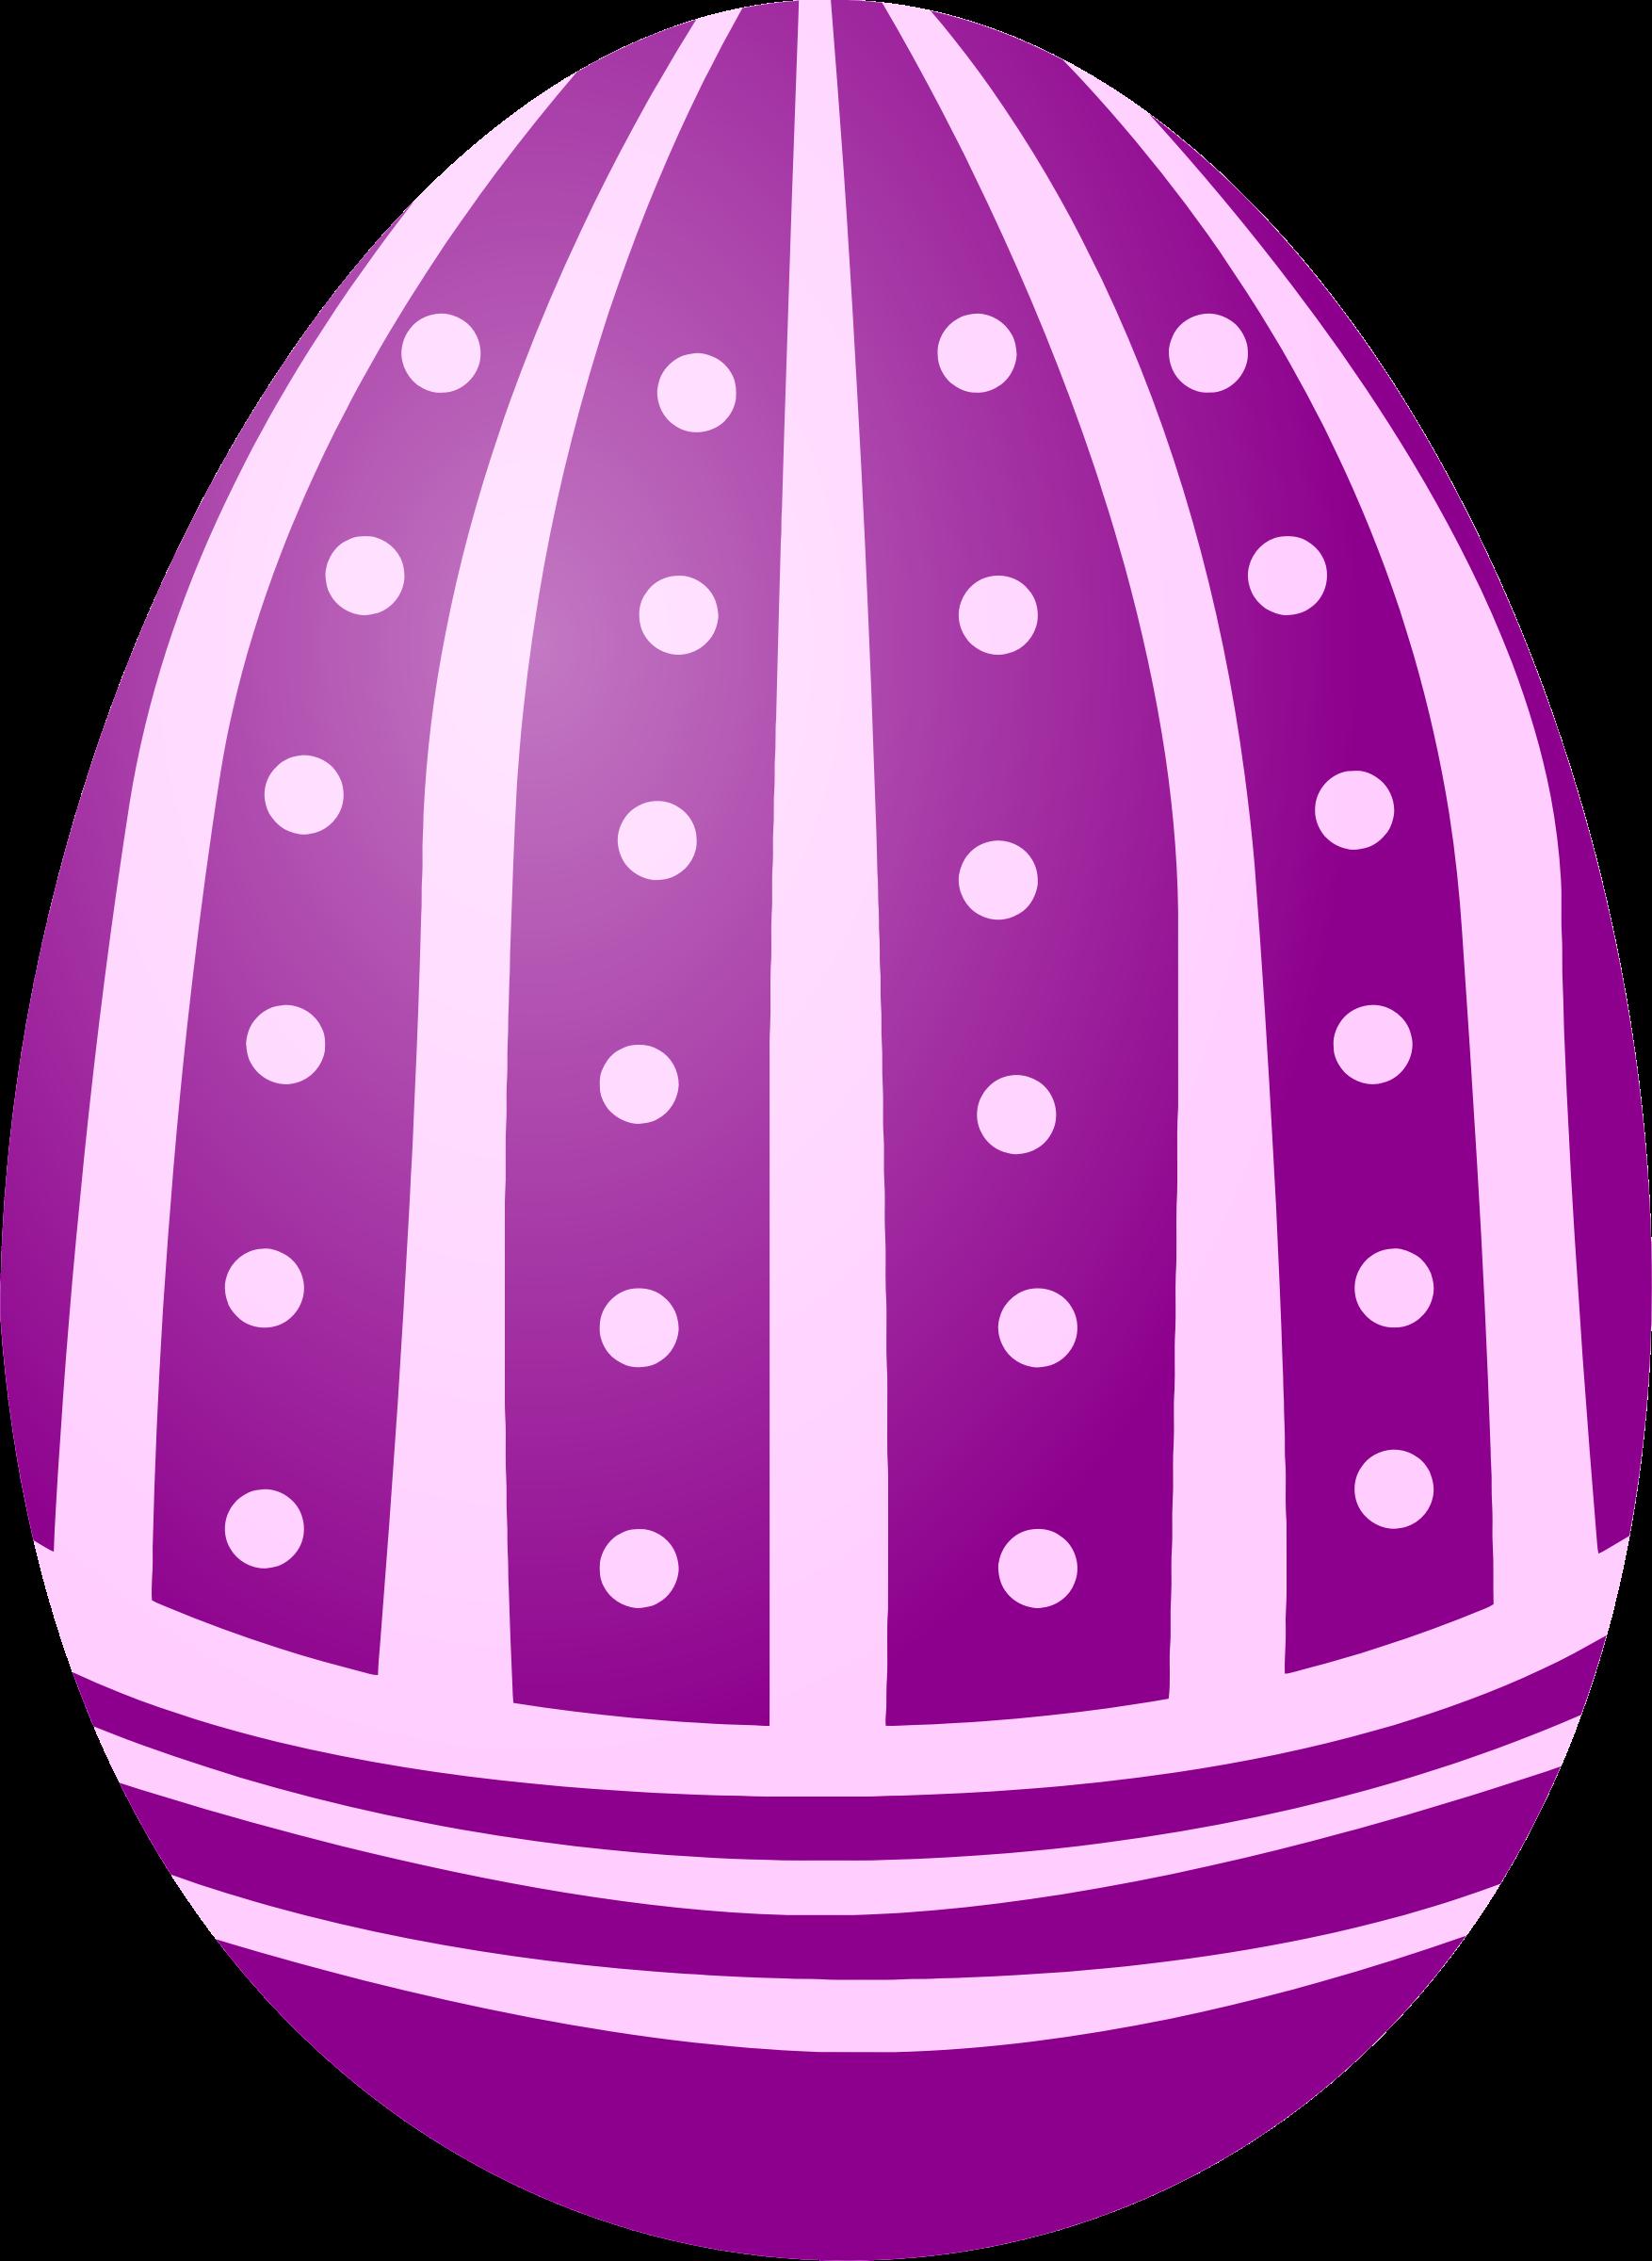 Dot clipart purple. Easter egg big image